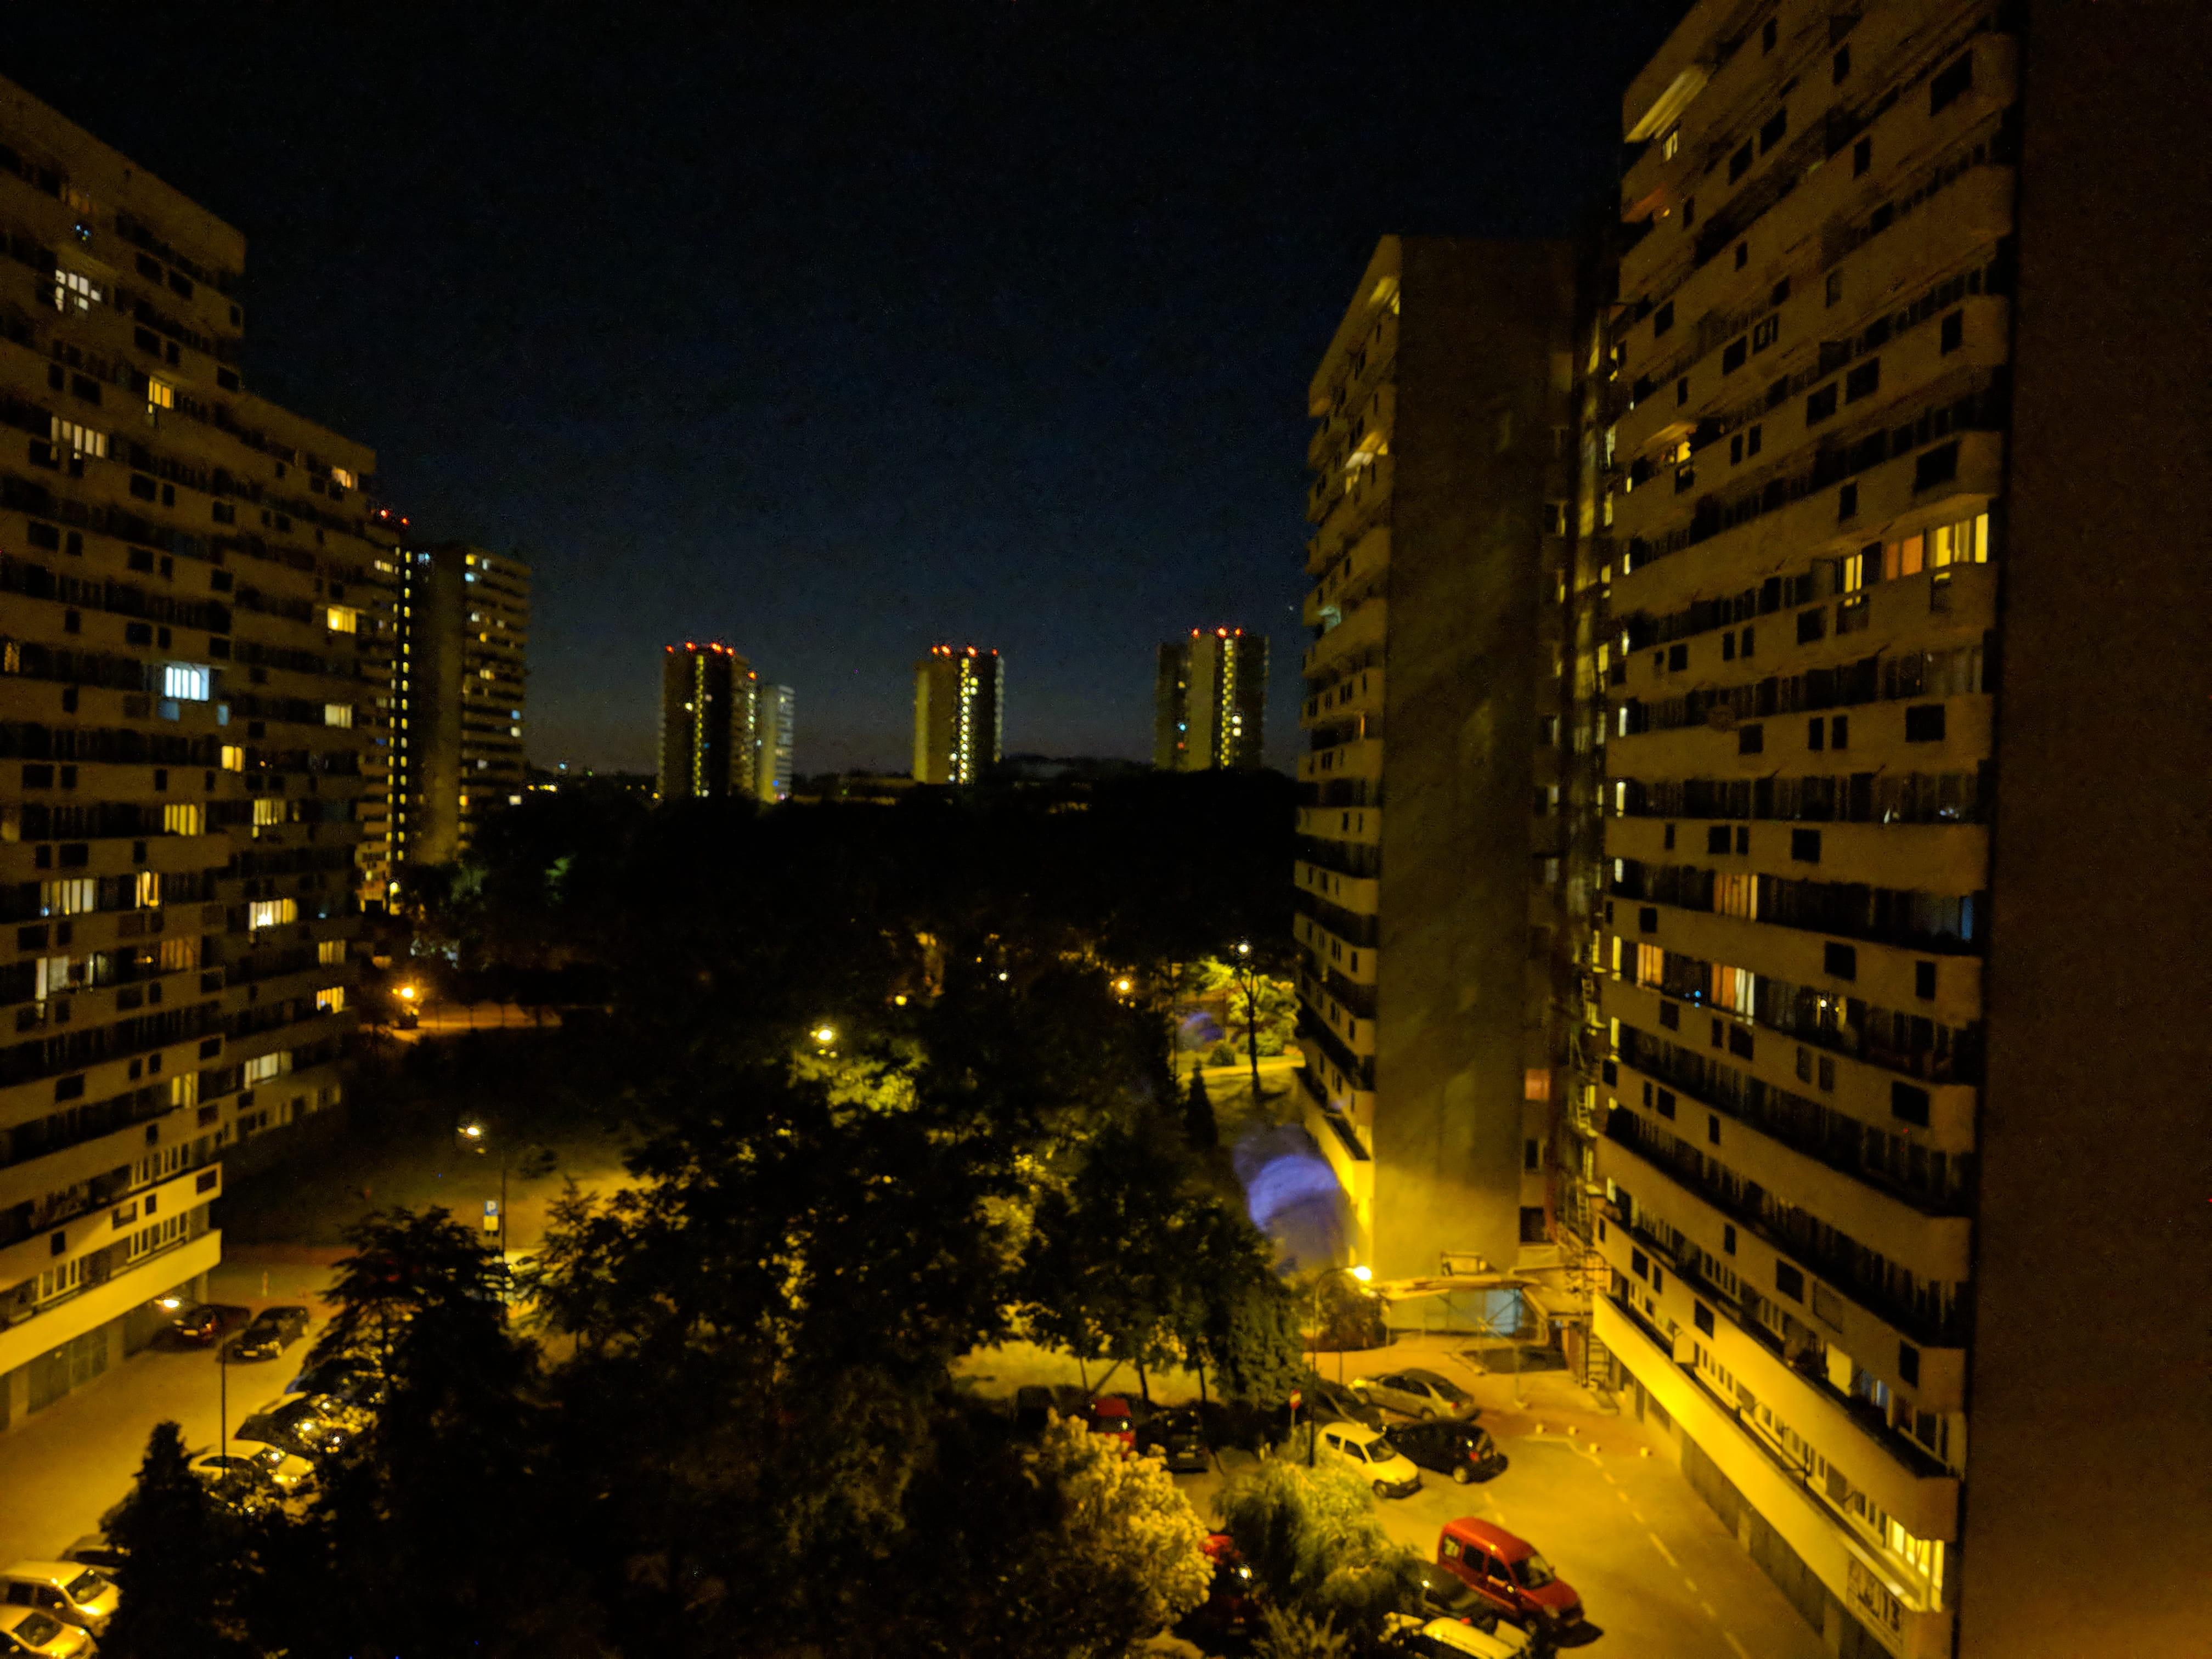 Zdjęcia nocne - Google Pixel 2 XL